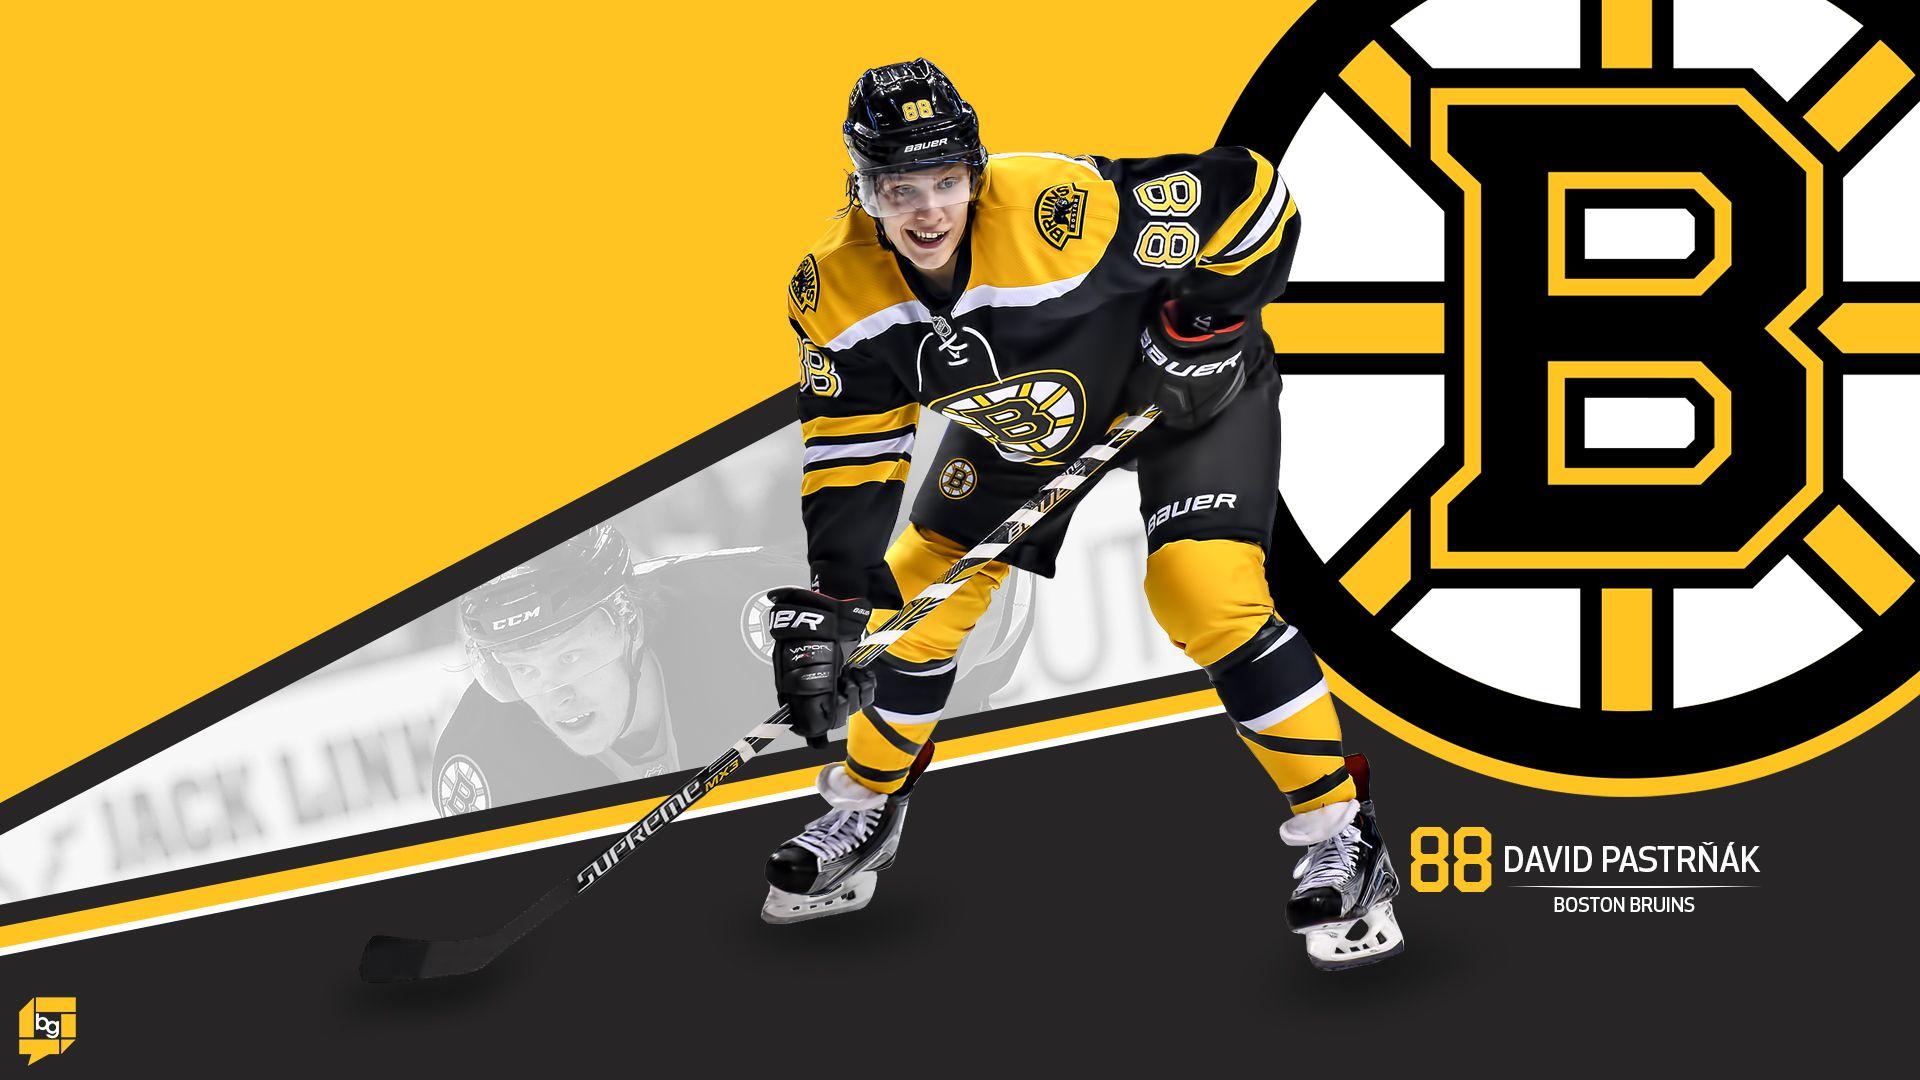 Boston Bruins Wallpaper Free Download a Pinterest